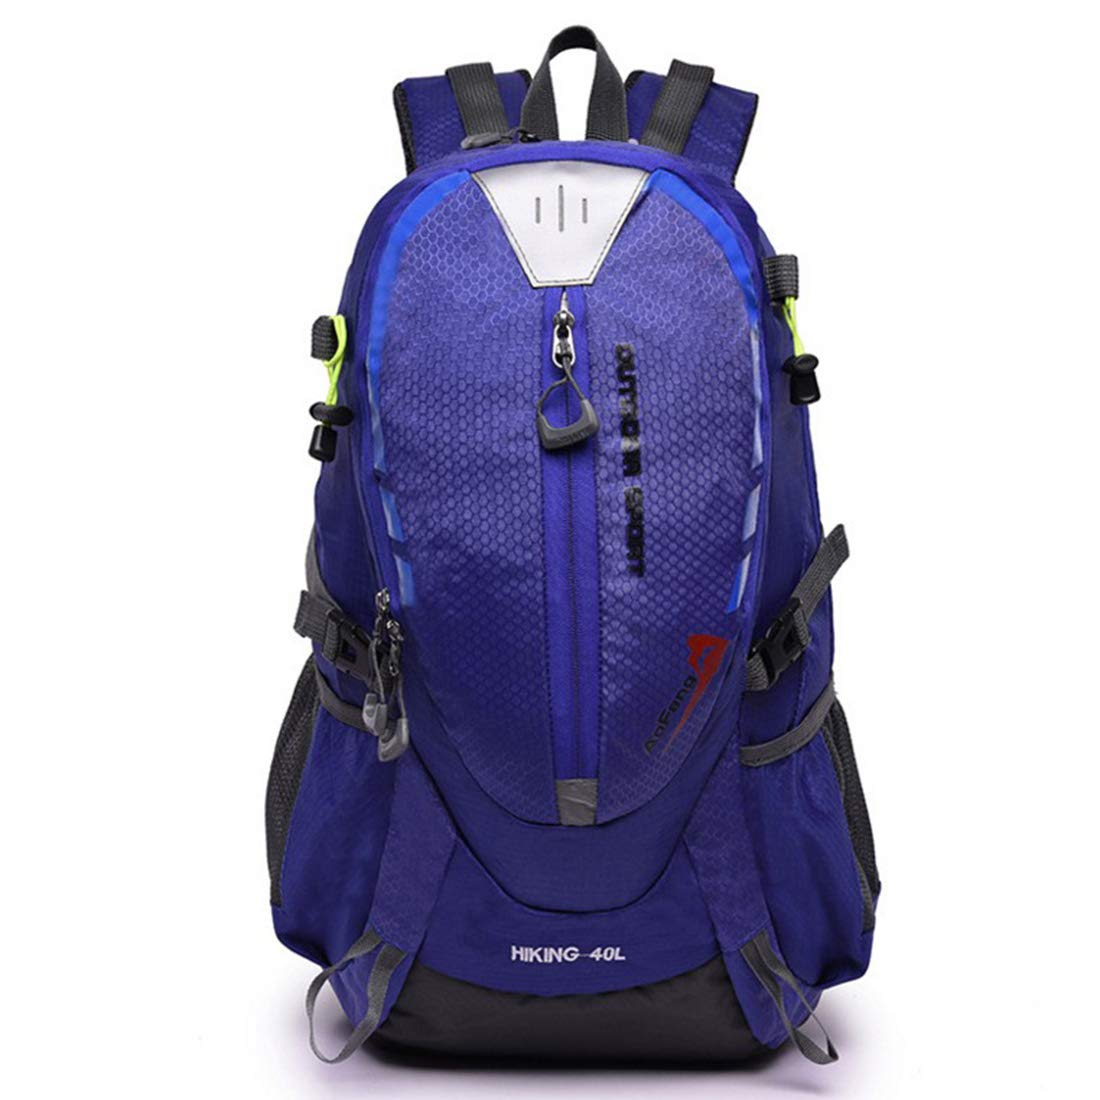 JESSIEKERVIN YY3 Outdoor Sports wasserdichte große Kapazität Wandern Tasche.